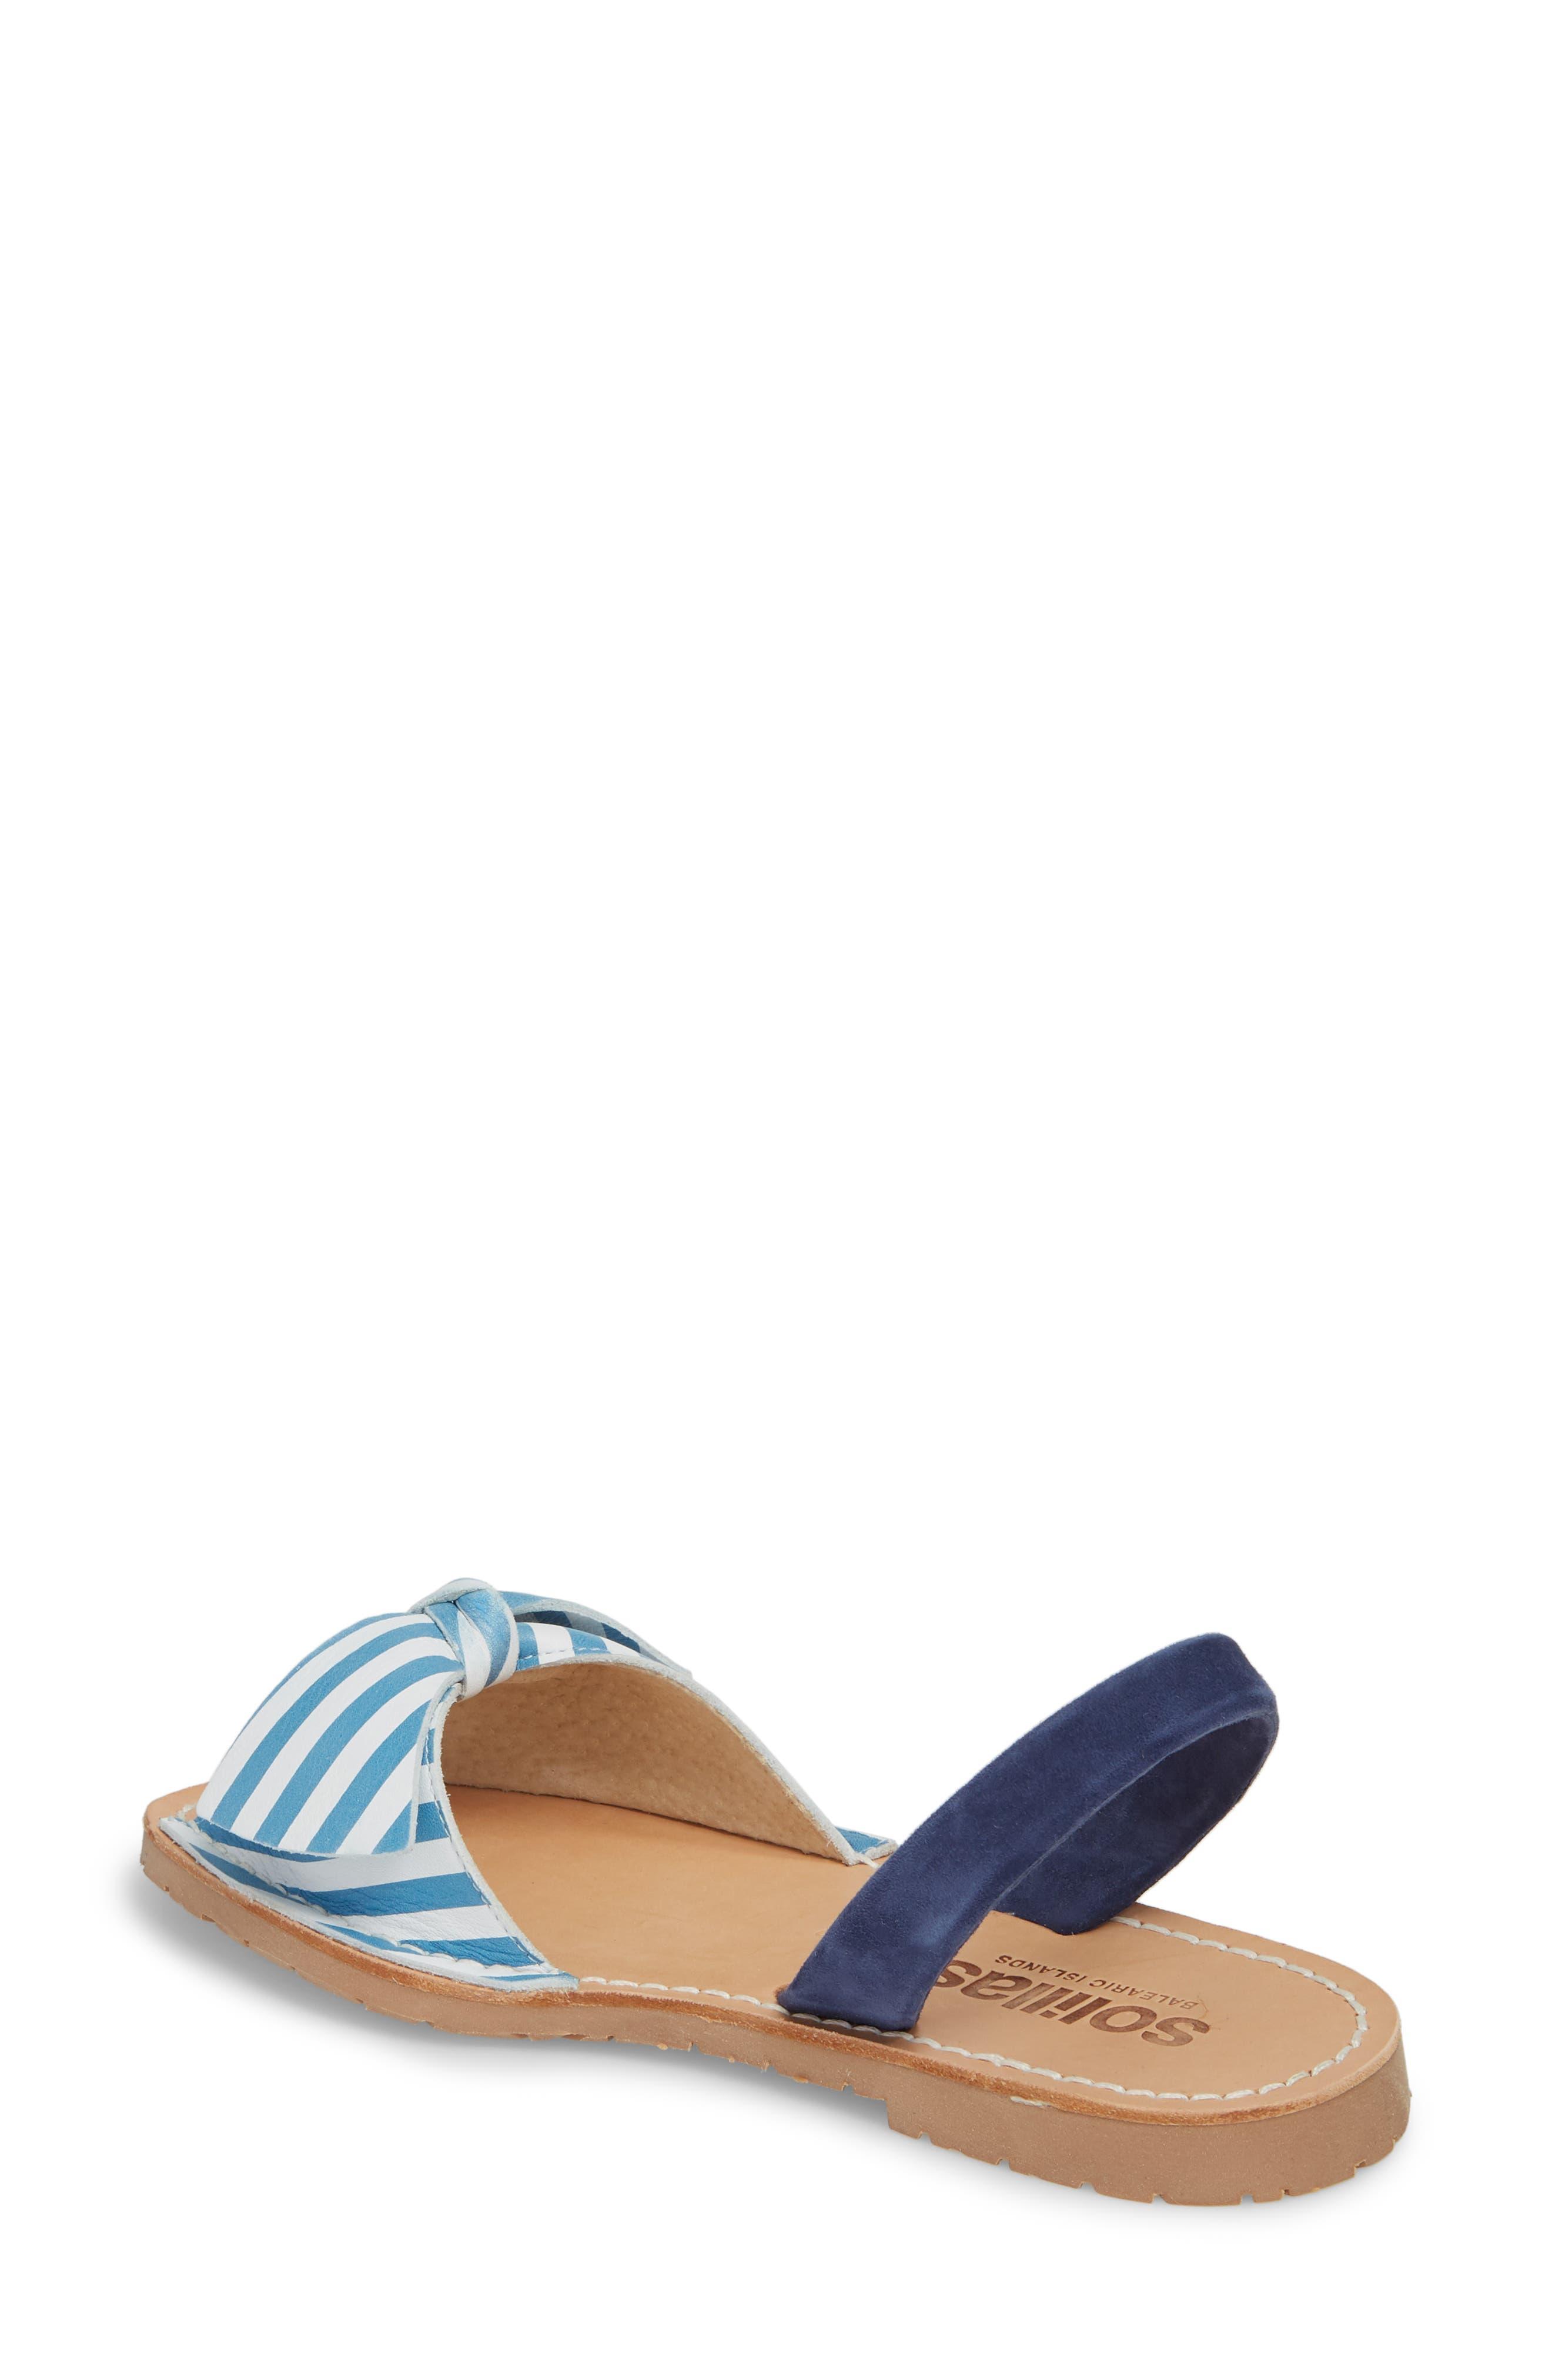 Bow Sandal,                             Alternate thumbnail 2, color,                             Blue And White